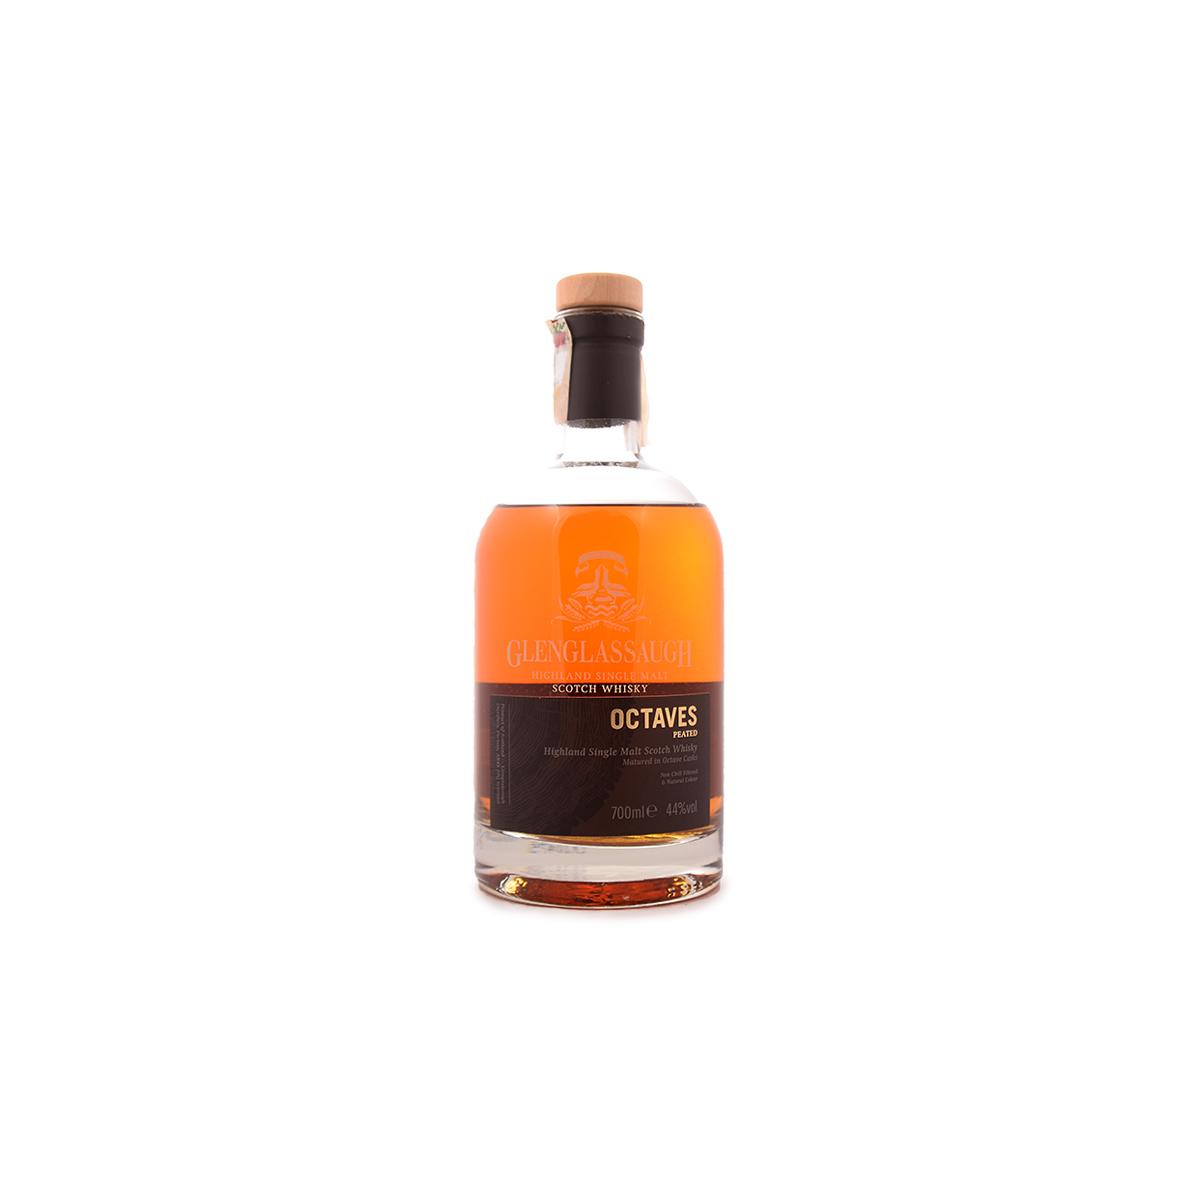 Glenglassaugh Octaves Peated (44%) - 30 ml.